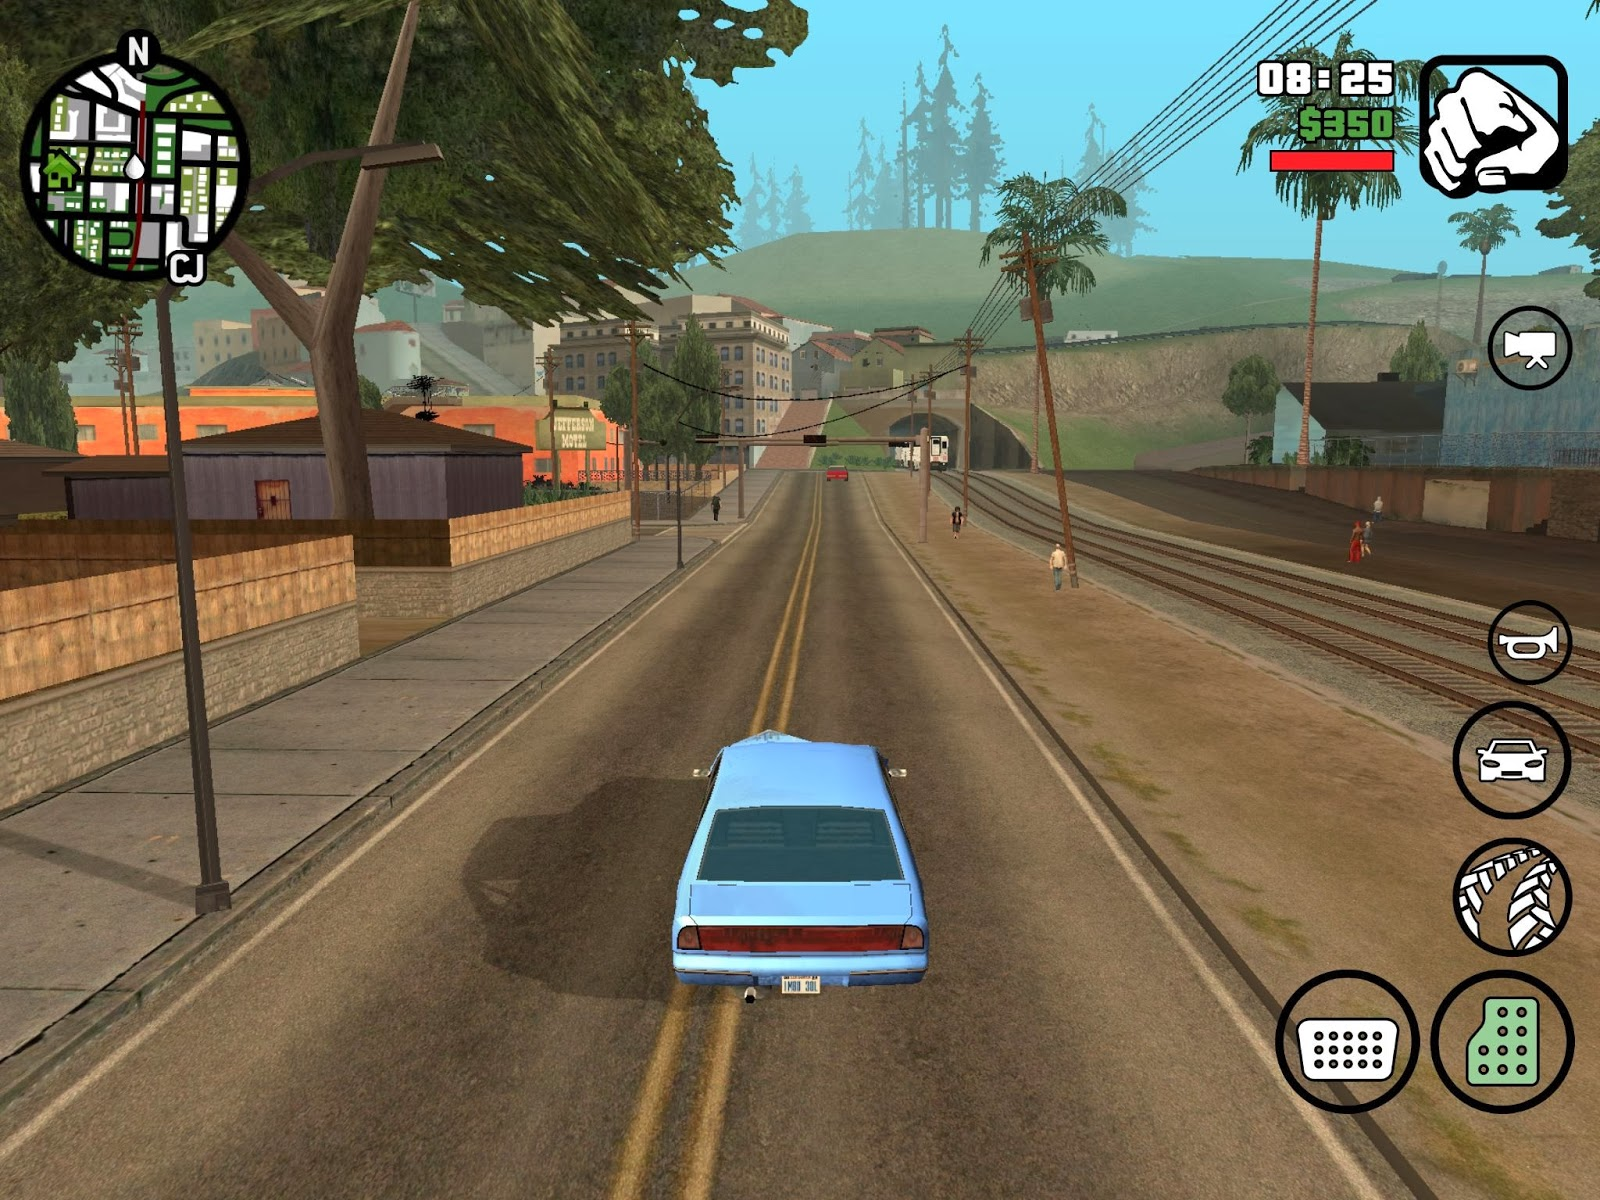 Gta San Andreas Apk Mod Free Download